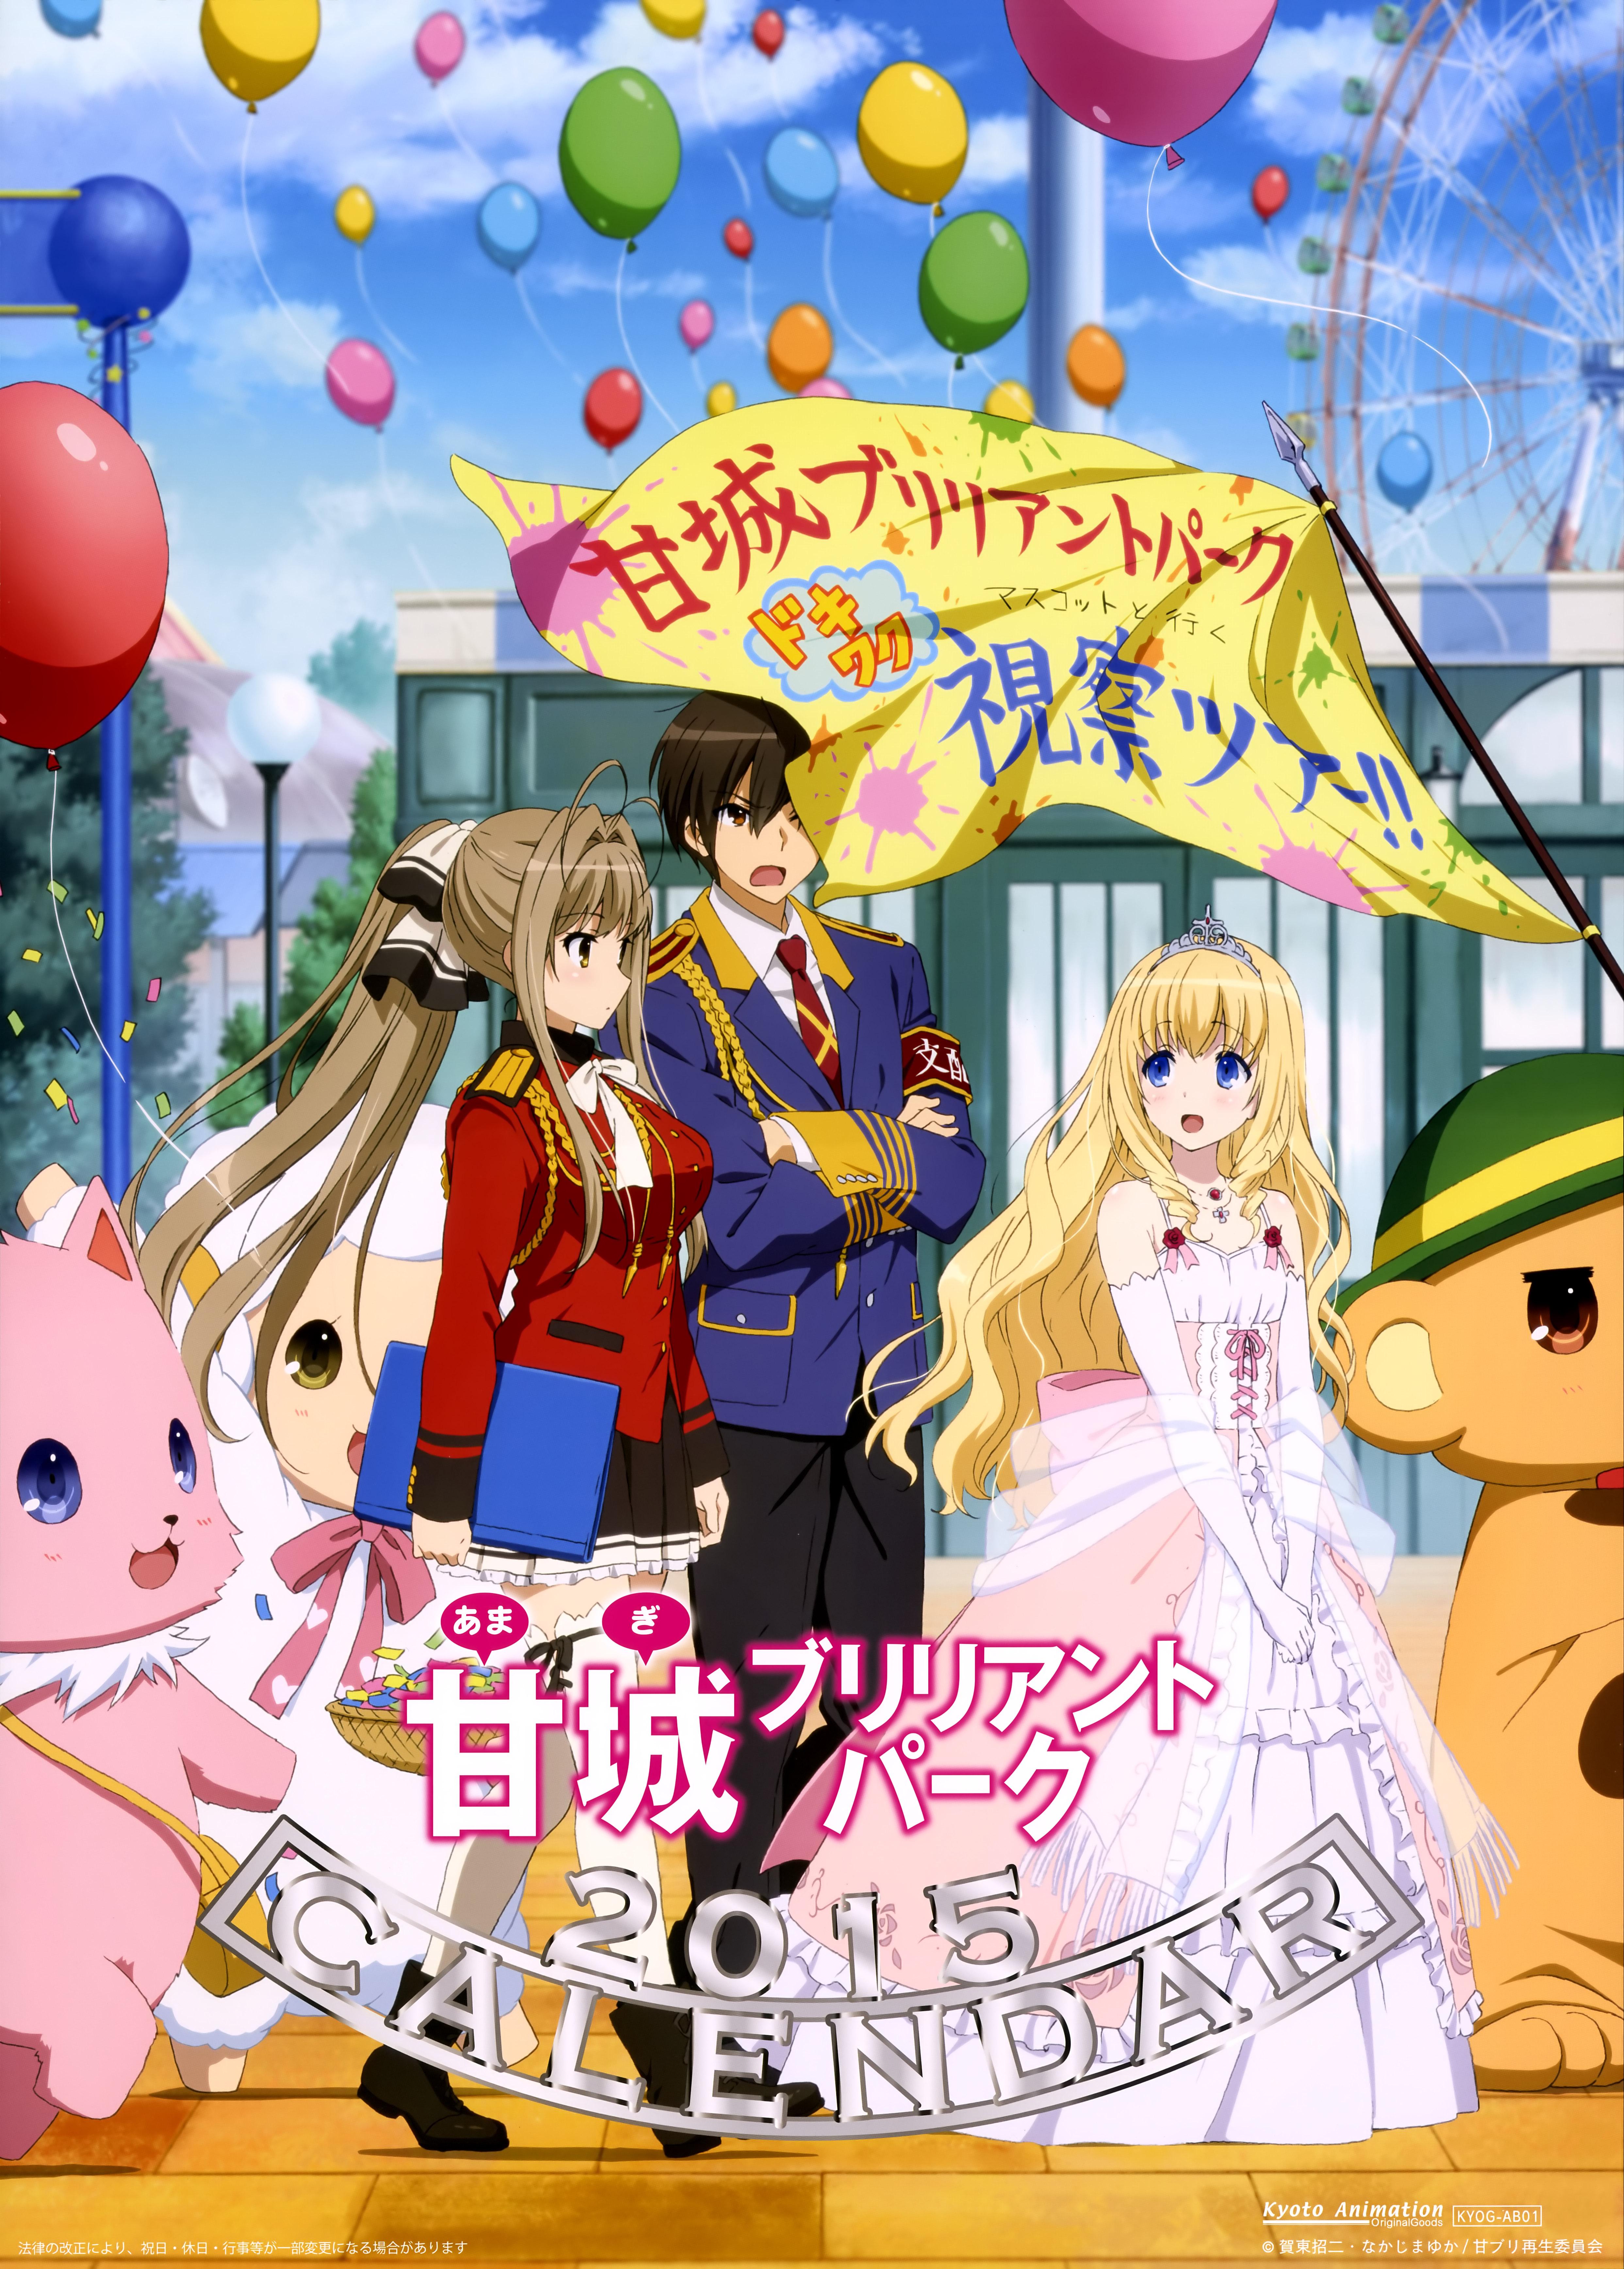 Amagi Brilliant Park 2015 Calendar Previewed Haruhichan.com amaburi anime calendar 00